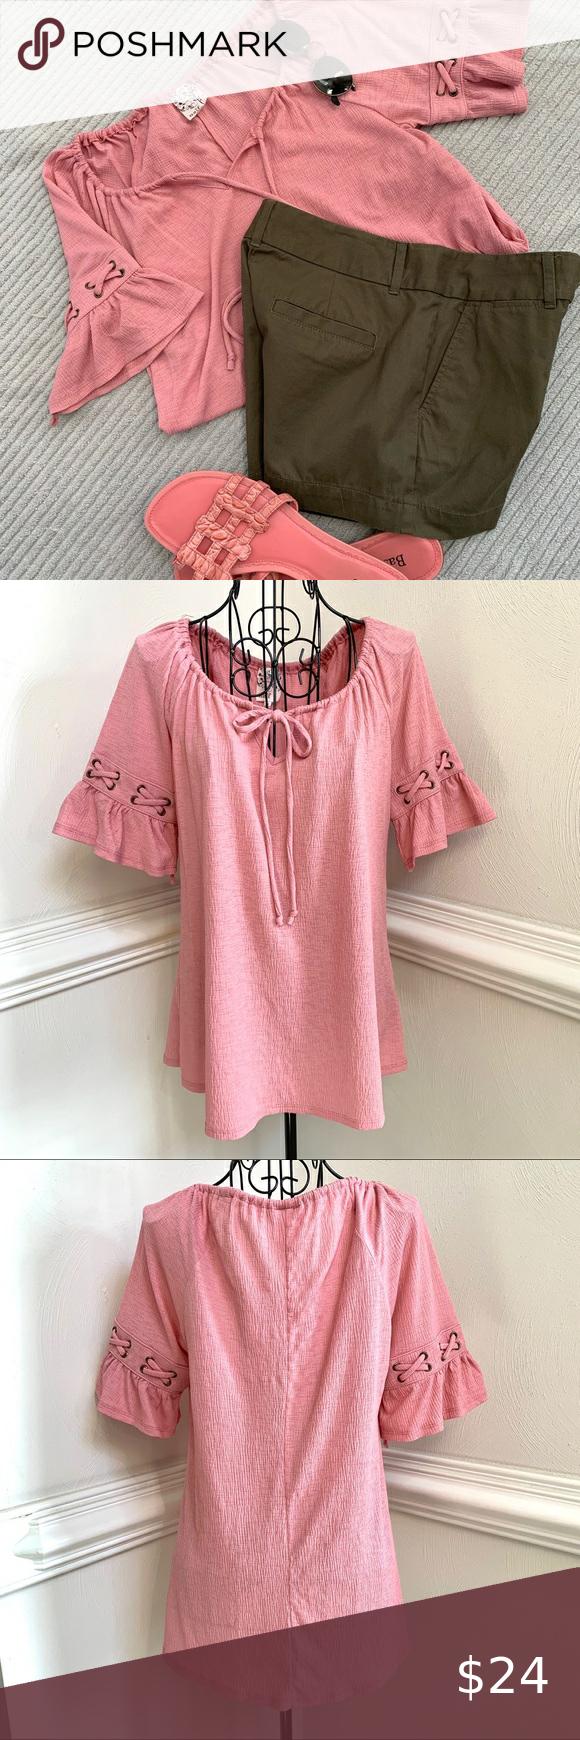 Naïf Drawstring Yoke Detailed Short Sleeve Shirt Dusty pink colored Naïf short sleeve top. Criss Cross laced detailing on sleeves. Drawstring tie yo…